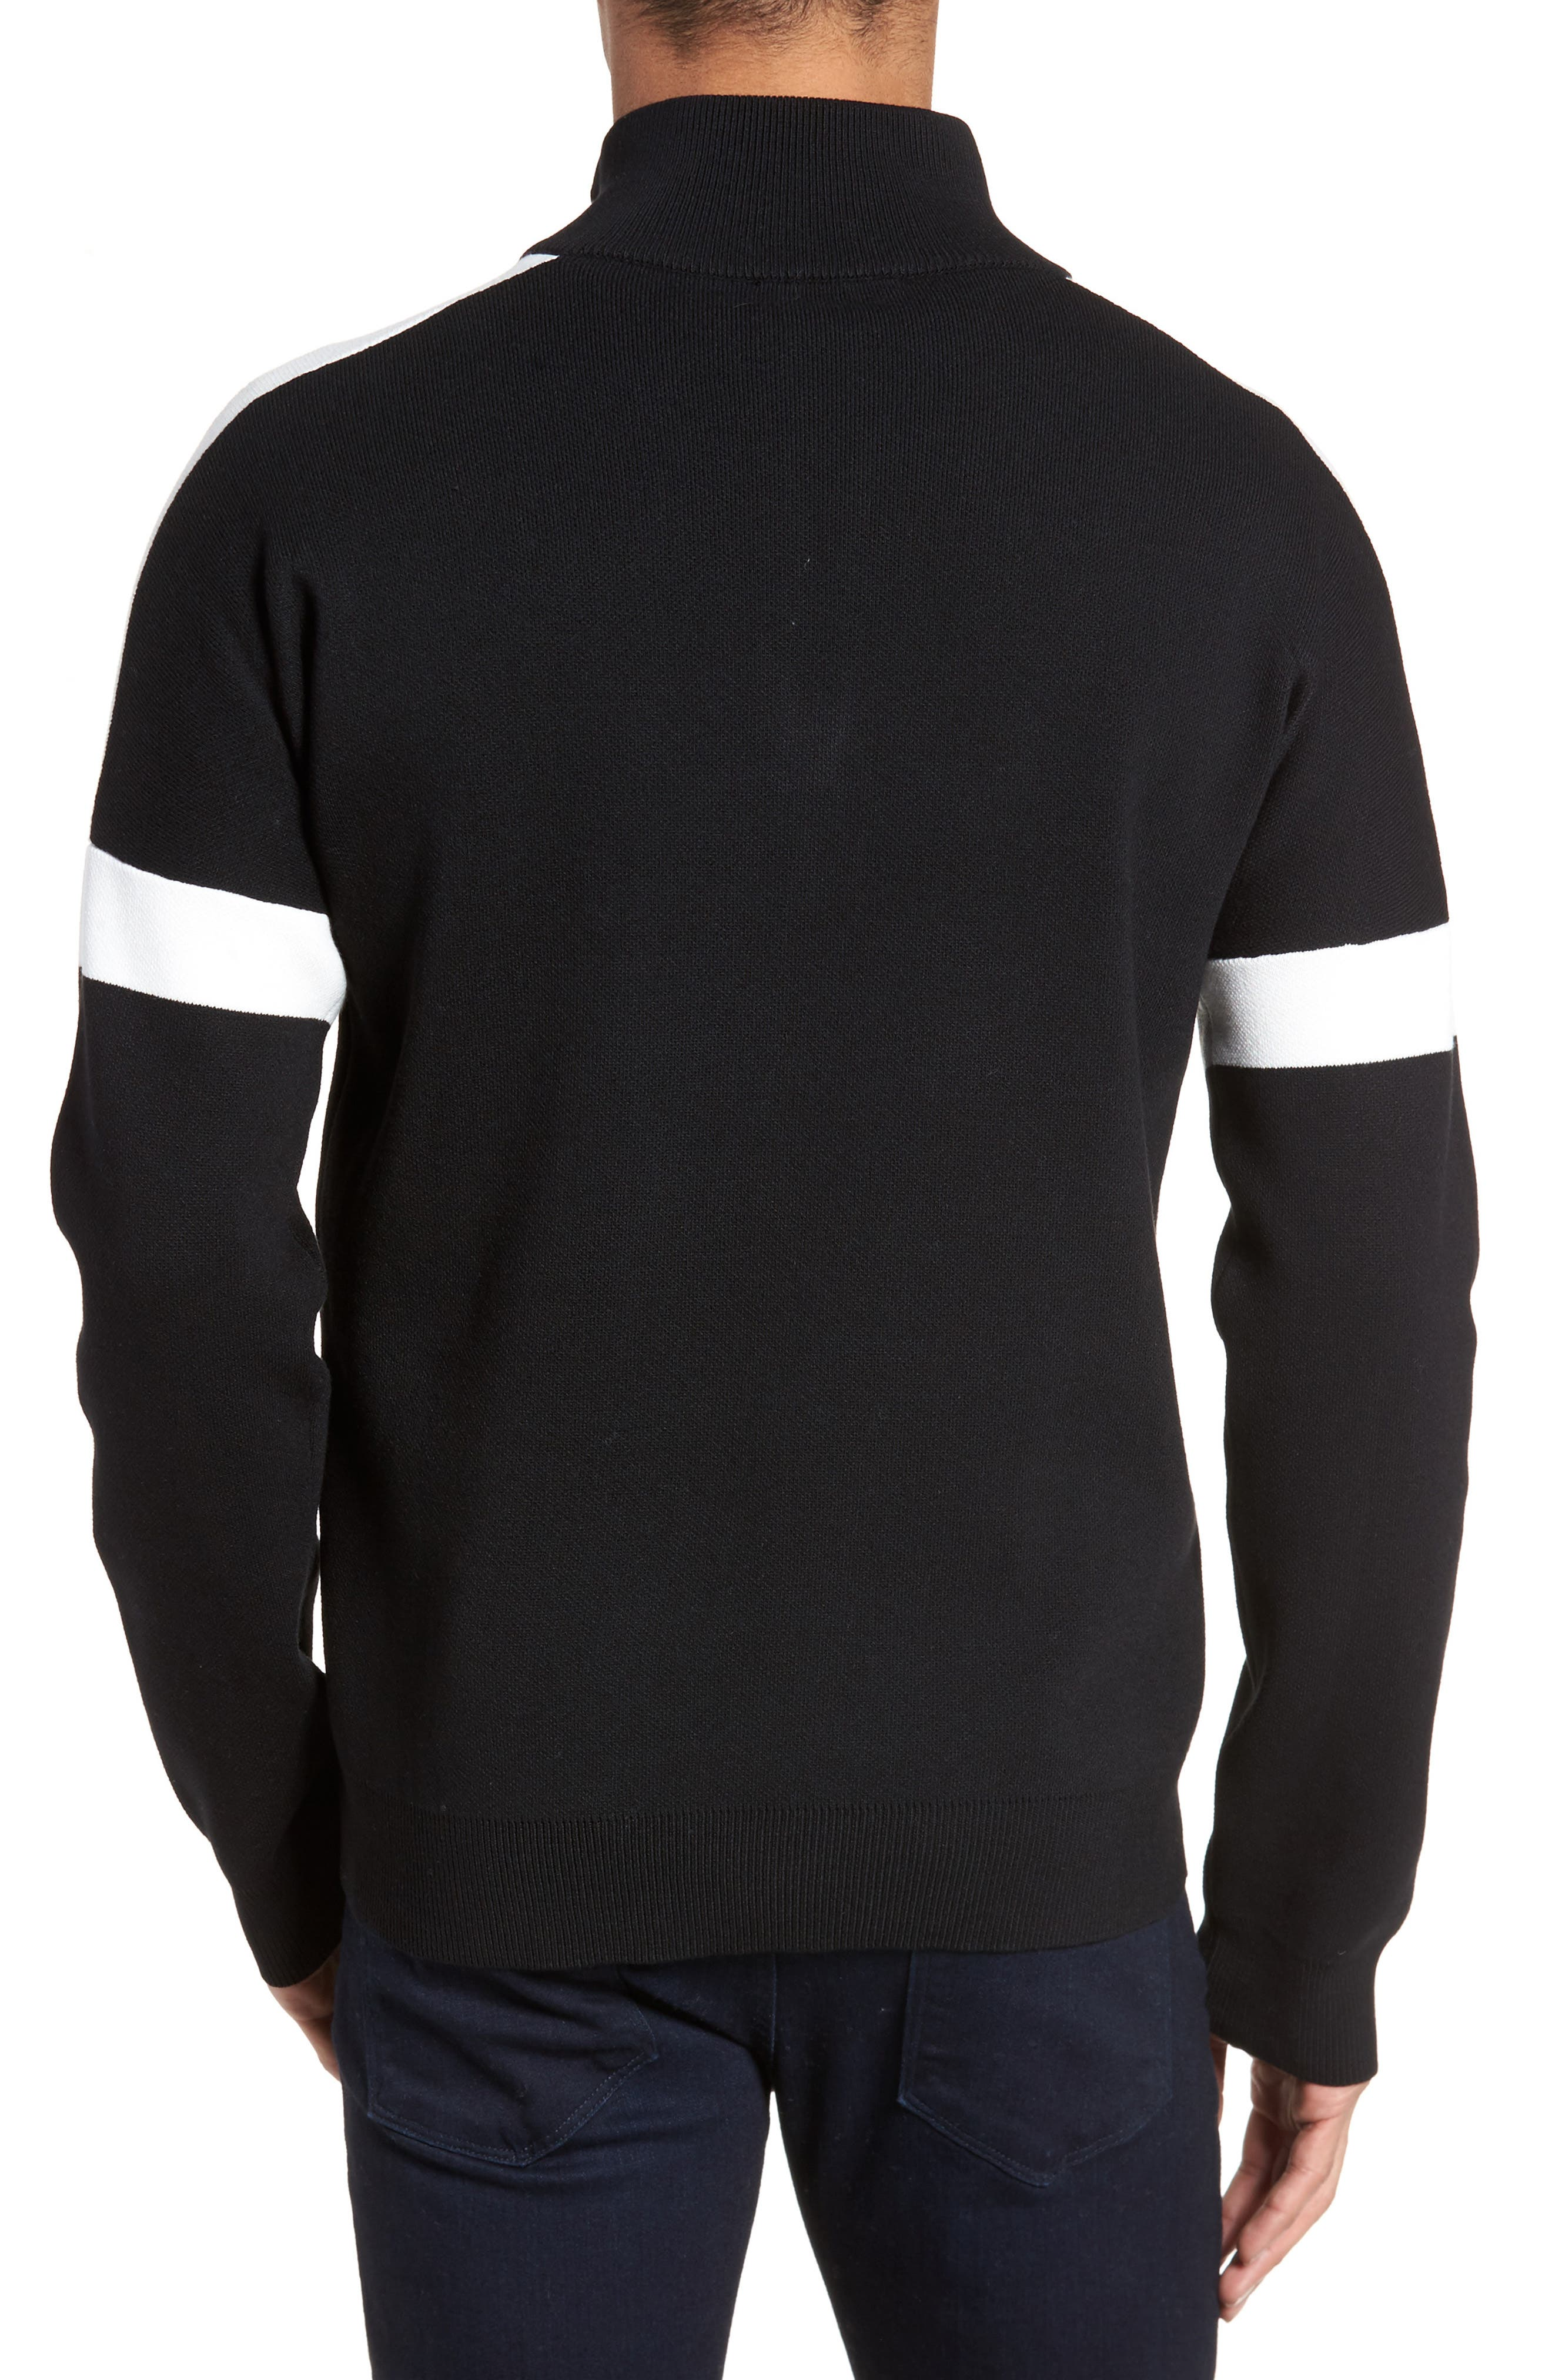 Lakra Regular Fit Half Zip Pullover,                             Alternate thumbnail 2, color,                             Black/Milk/Black